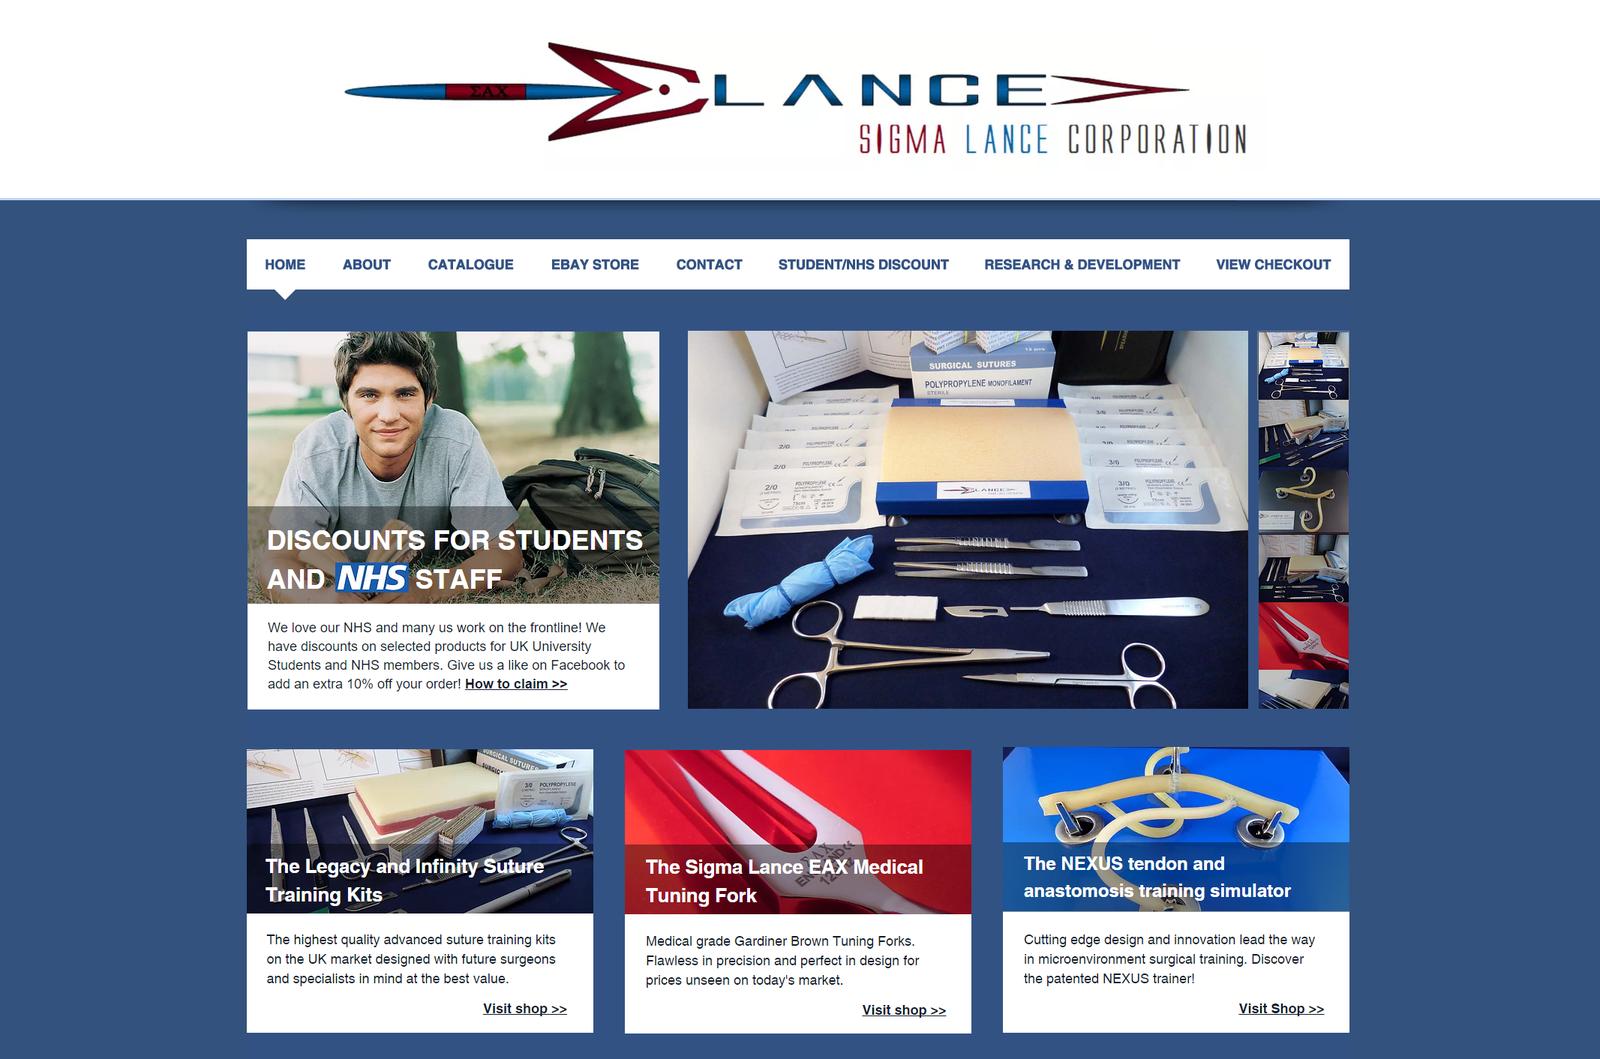 Sigma Lance Corporation